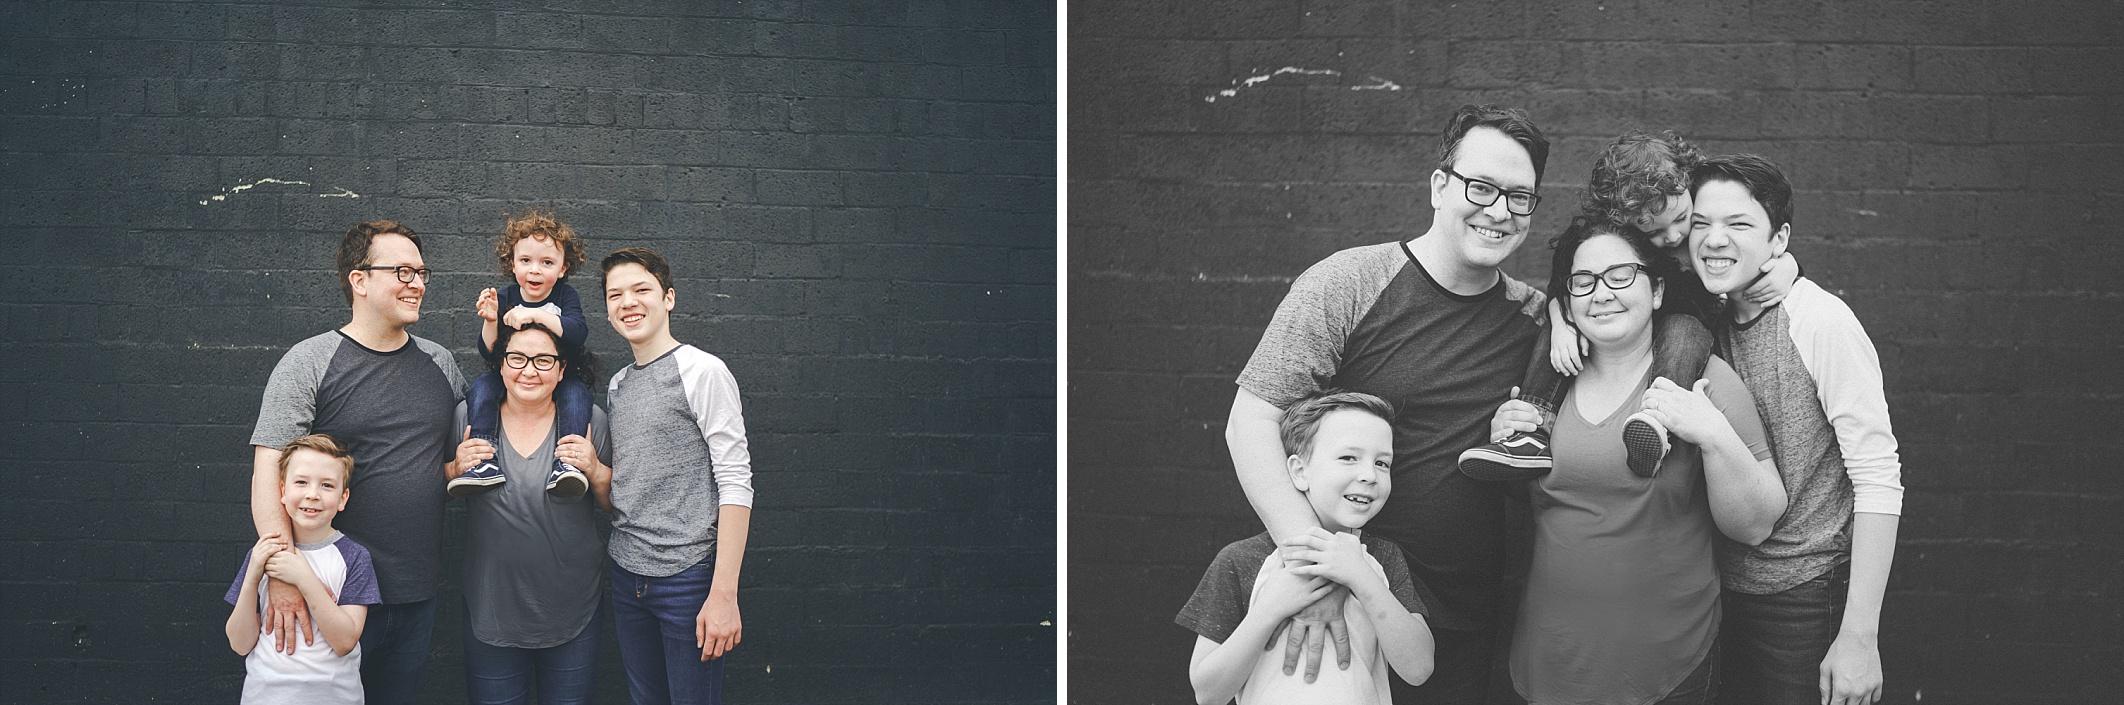 0027_young-family-children-photography-dayton.jpg